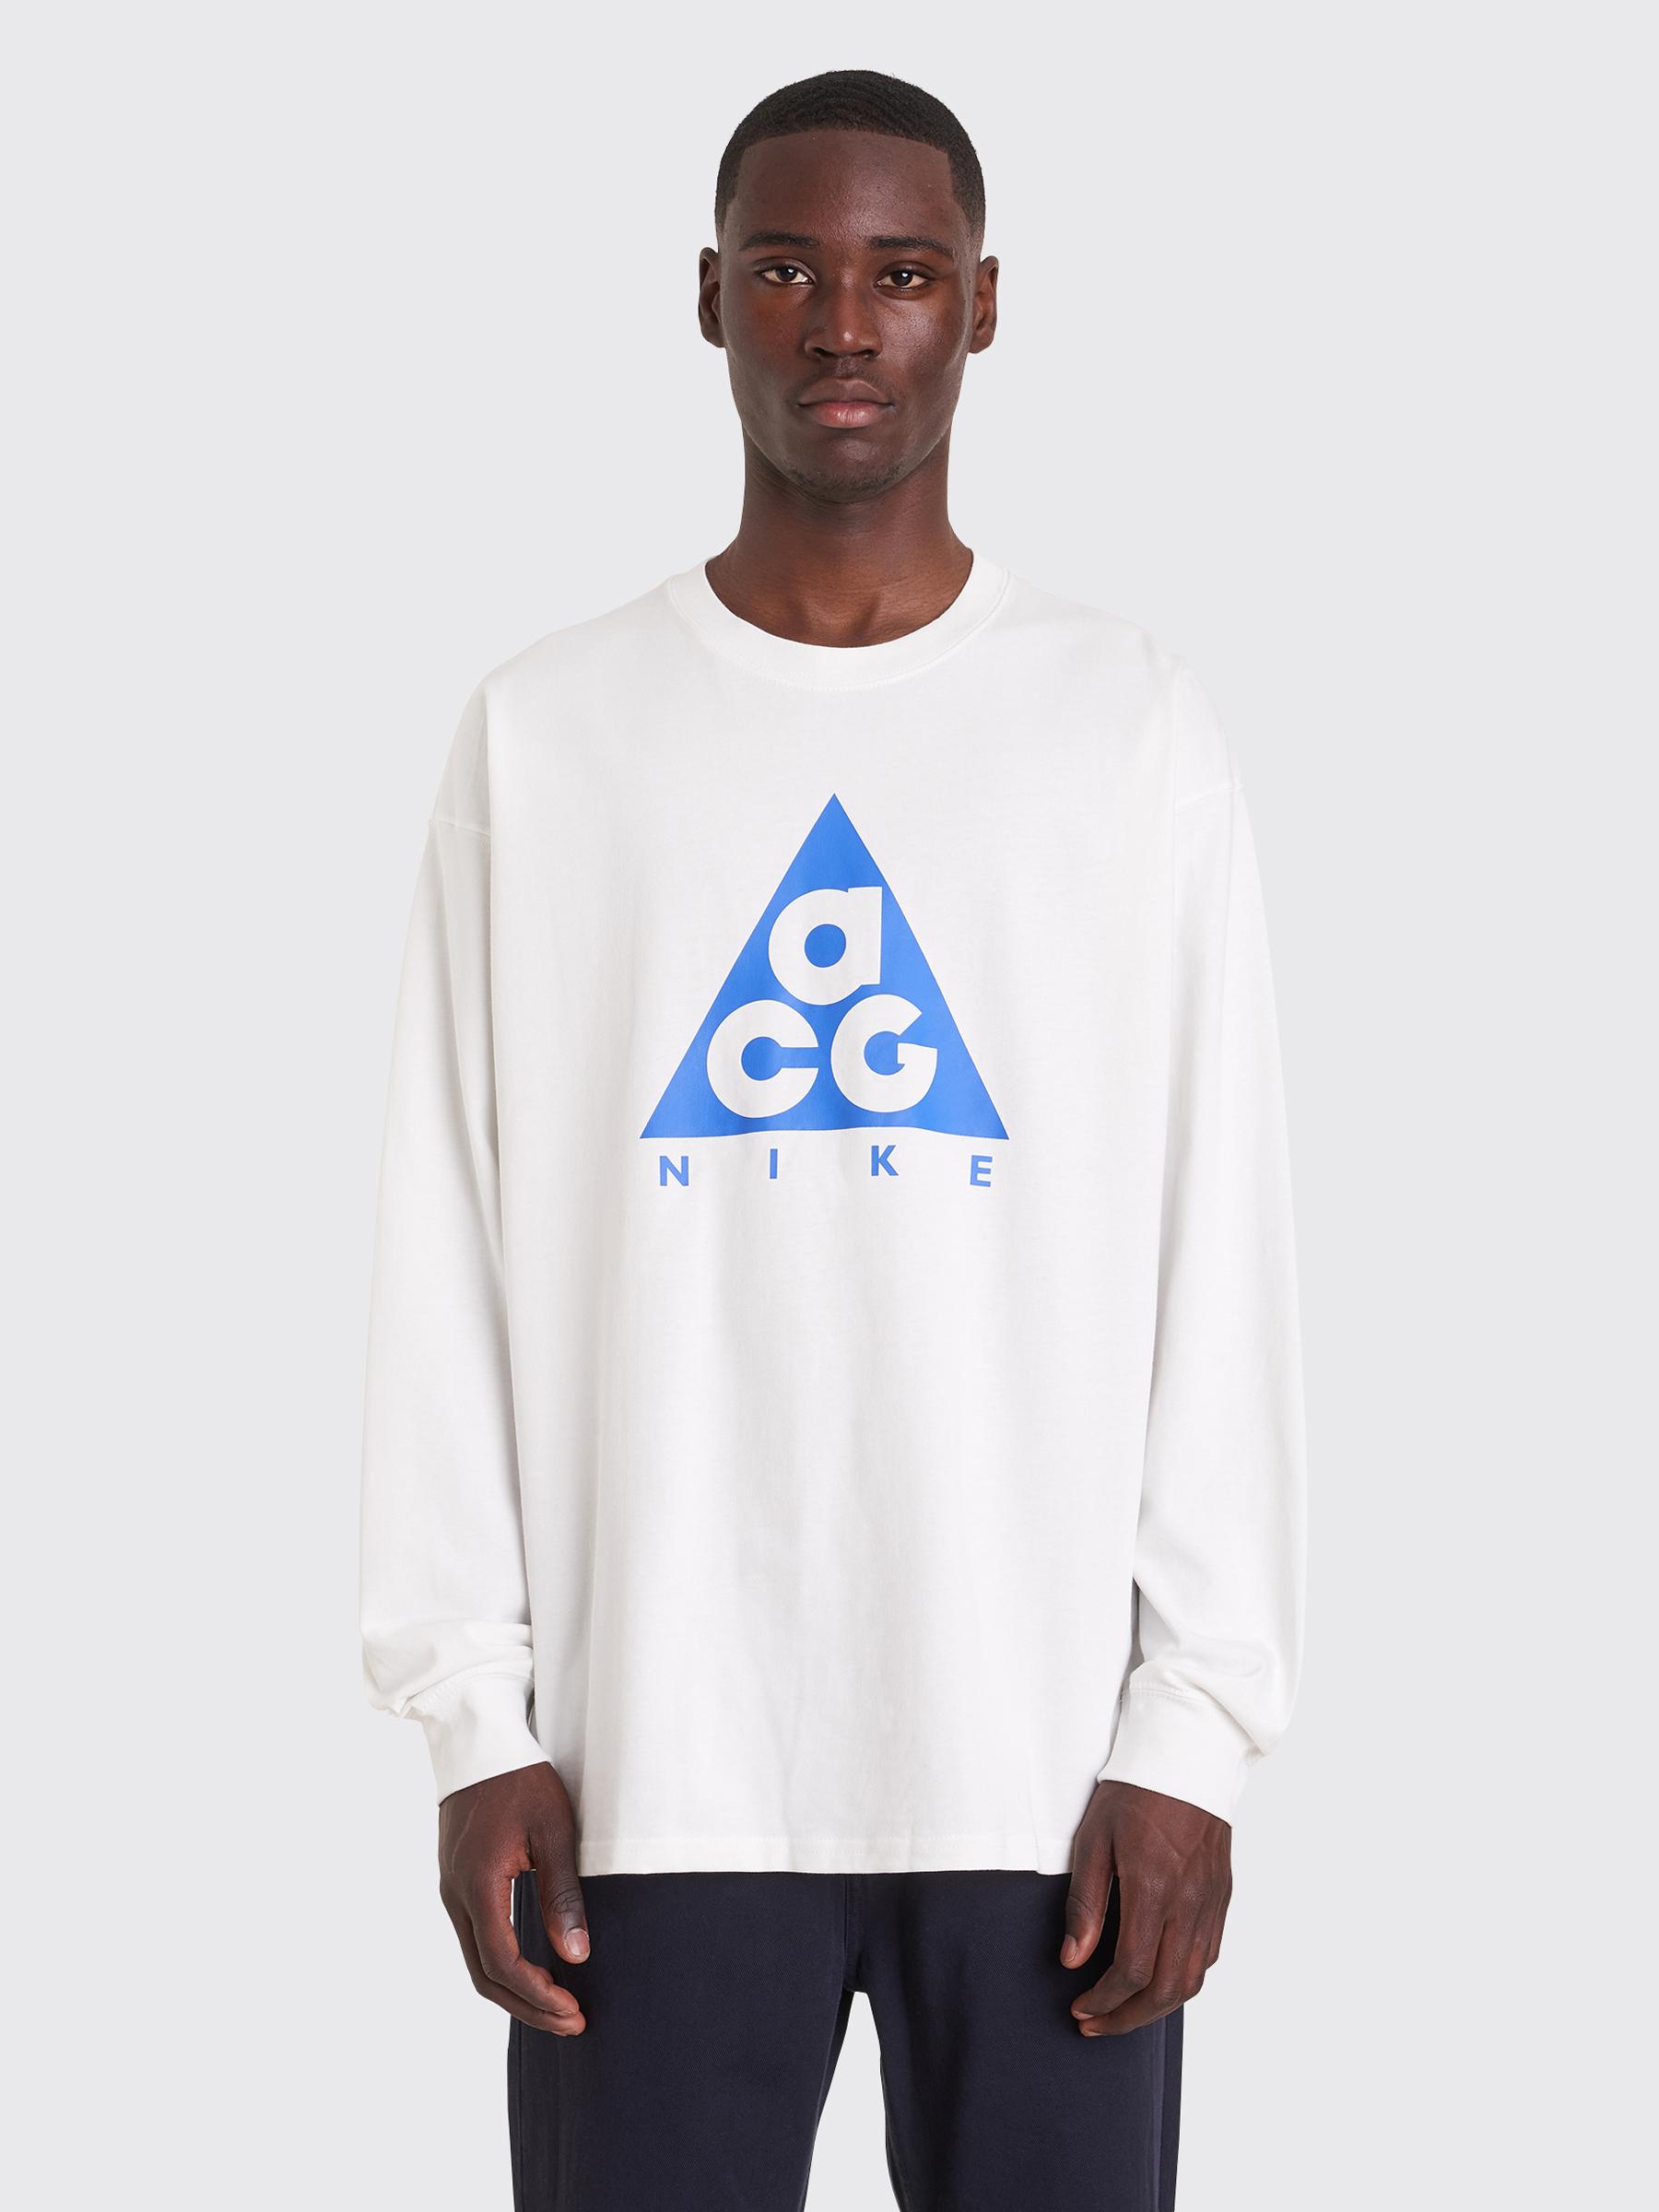 cb499d057 Très Bien - Nike ACG NRG Logo Longsleeve T-shirt White